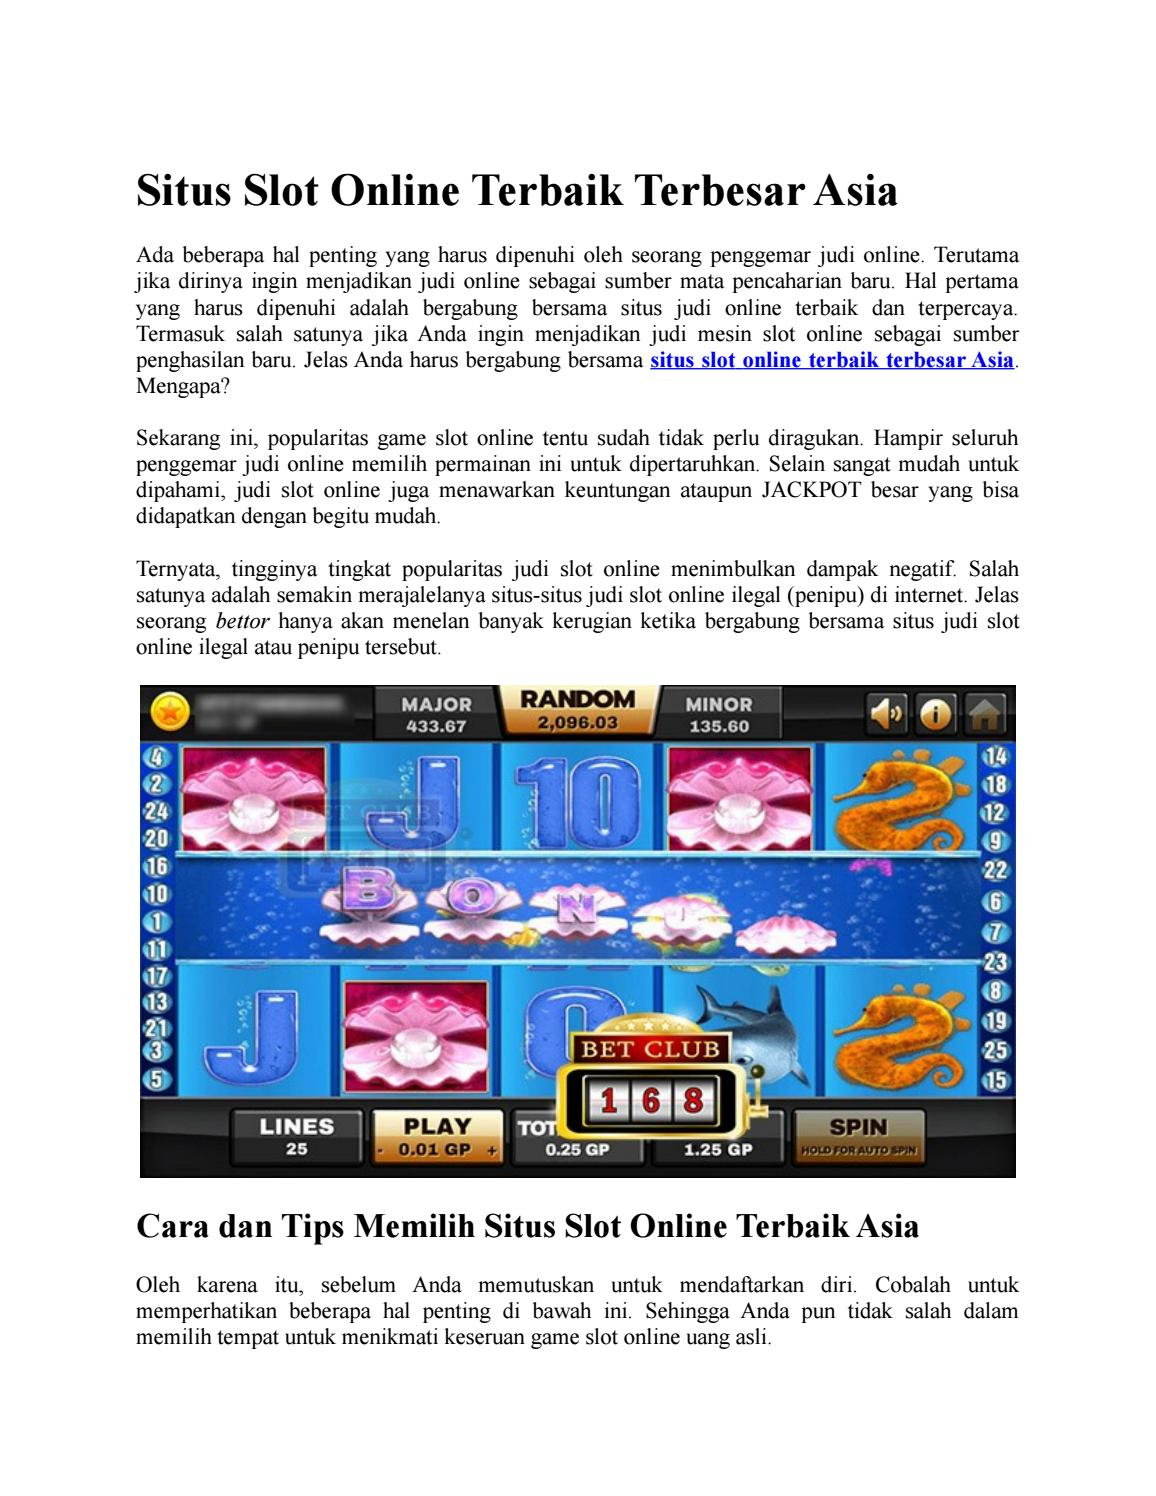 Situs Slot Online Terbaik Terbesar Asia By Erlyn Zhang Issuu